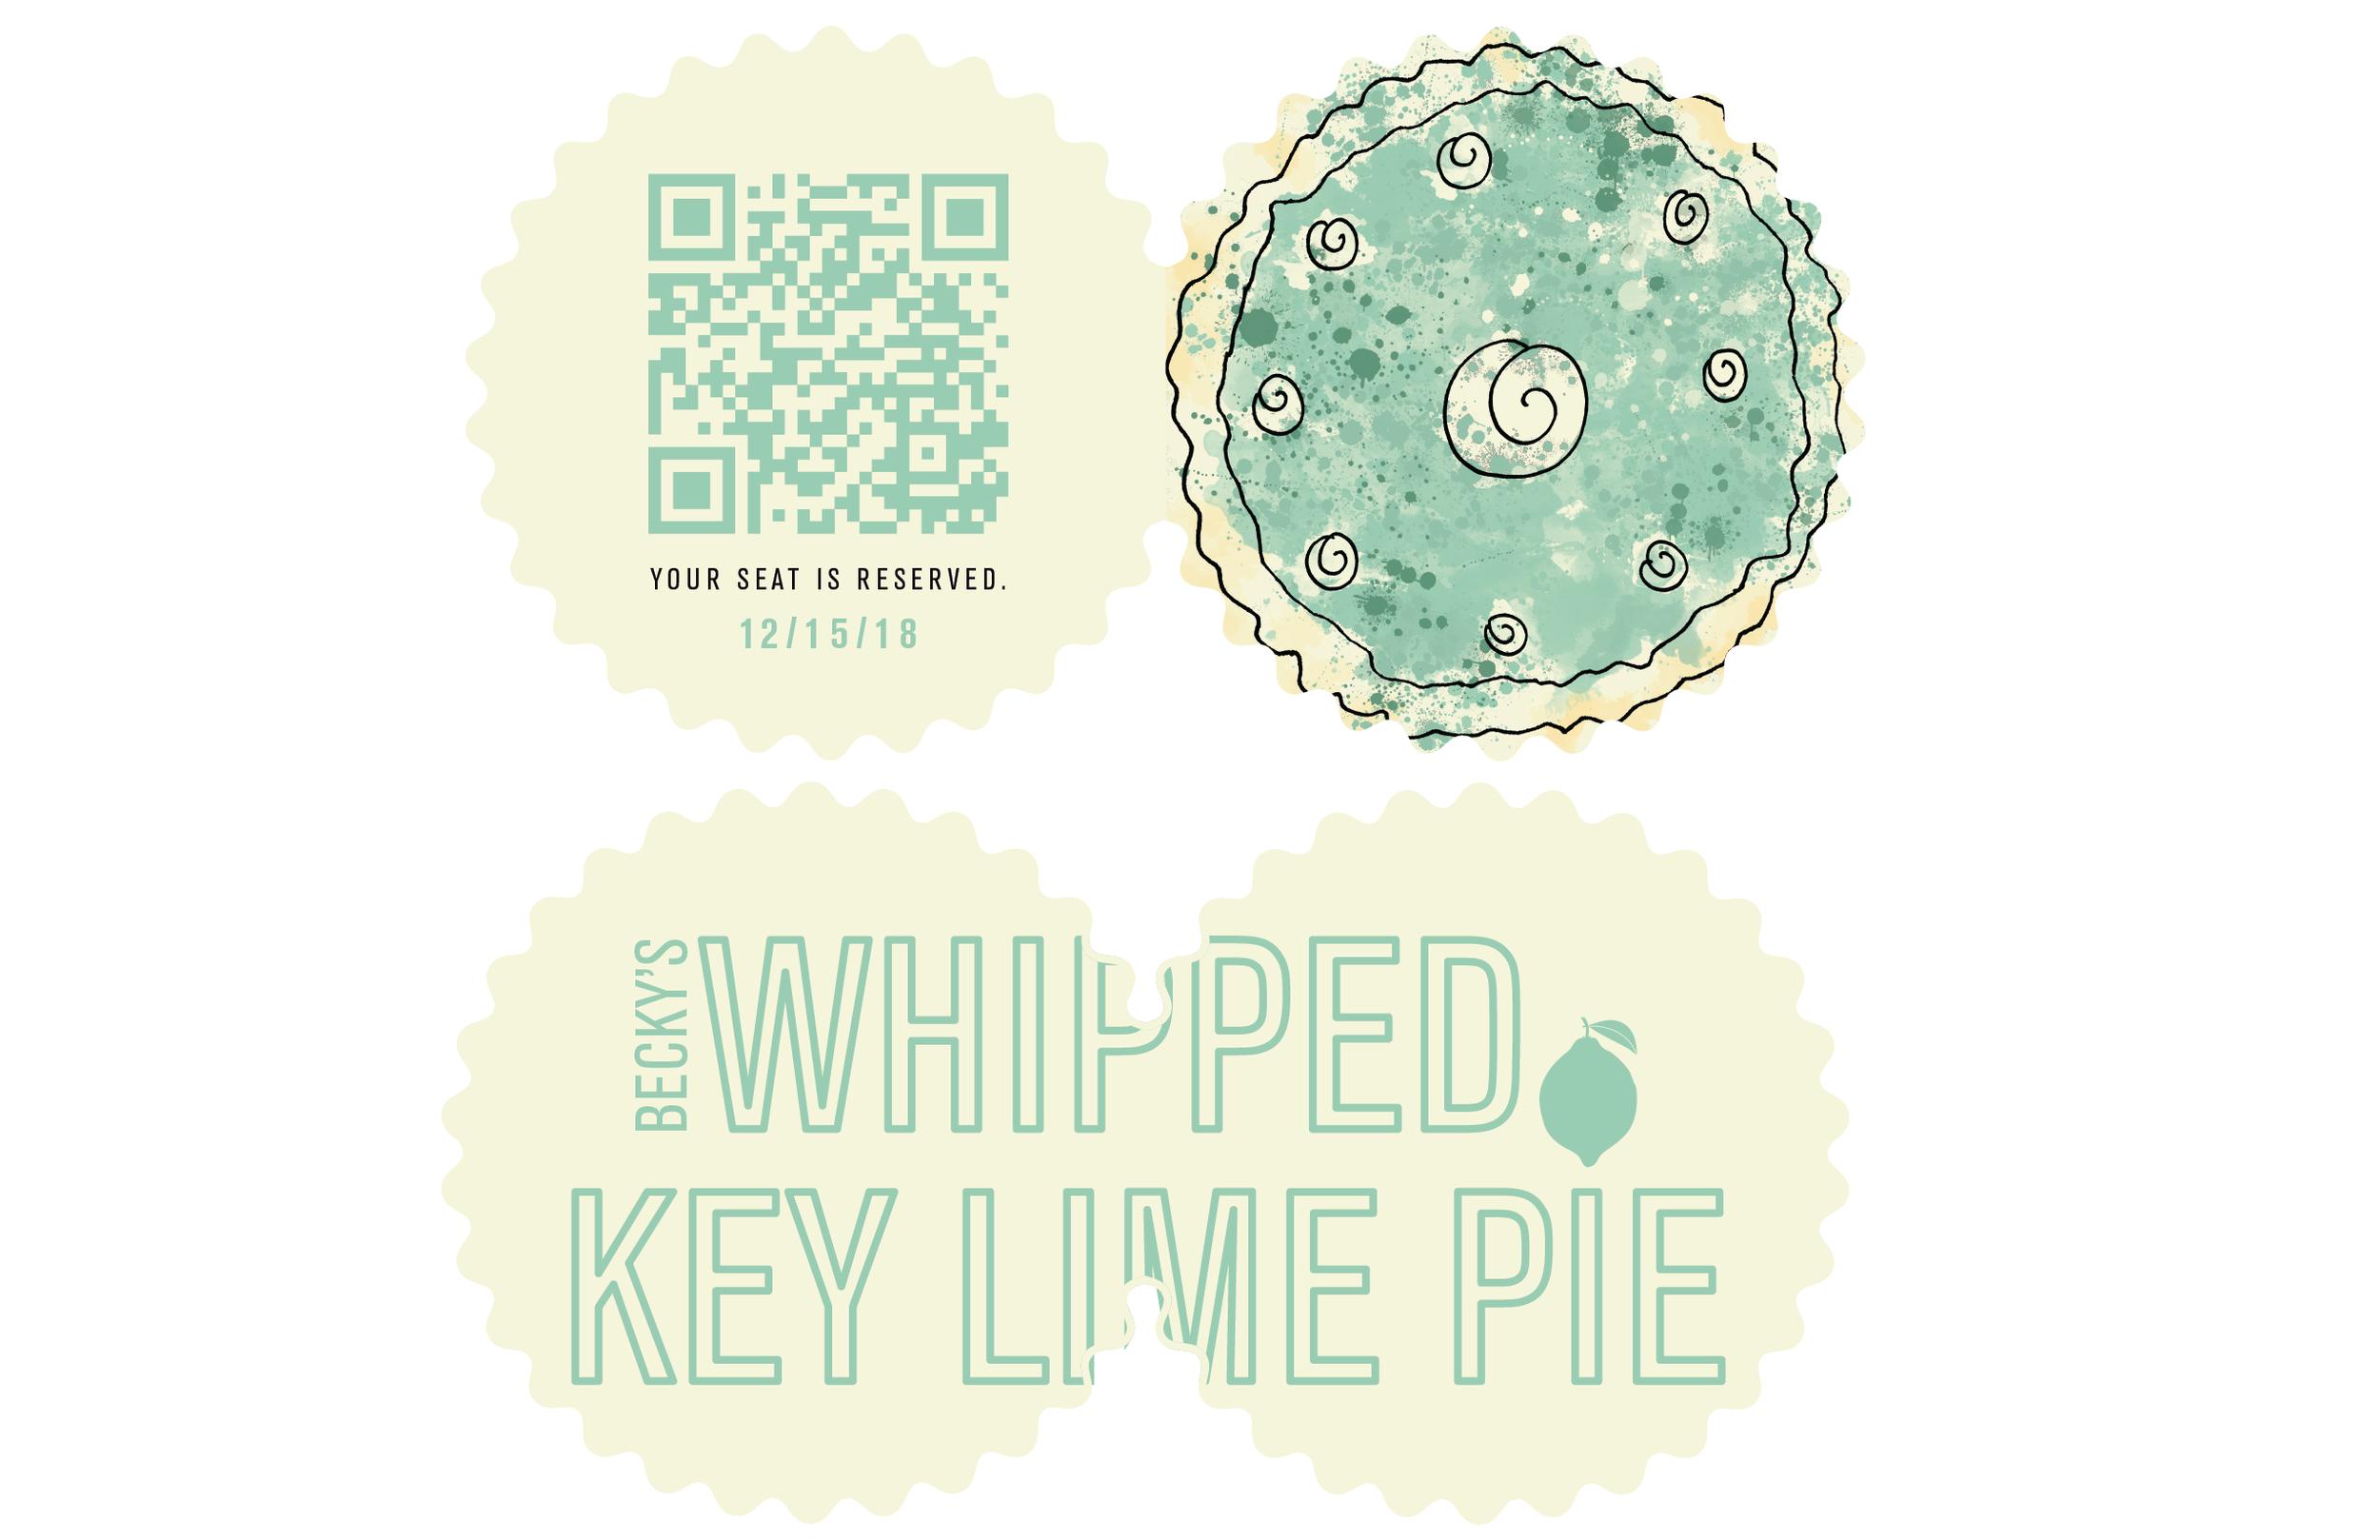 key lime dm-09.png